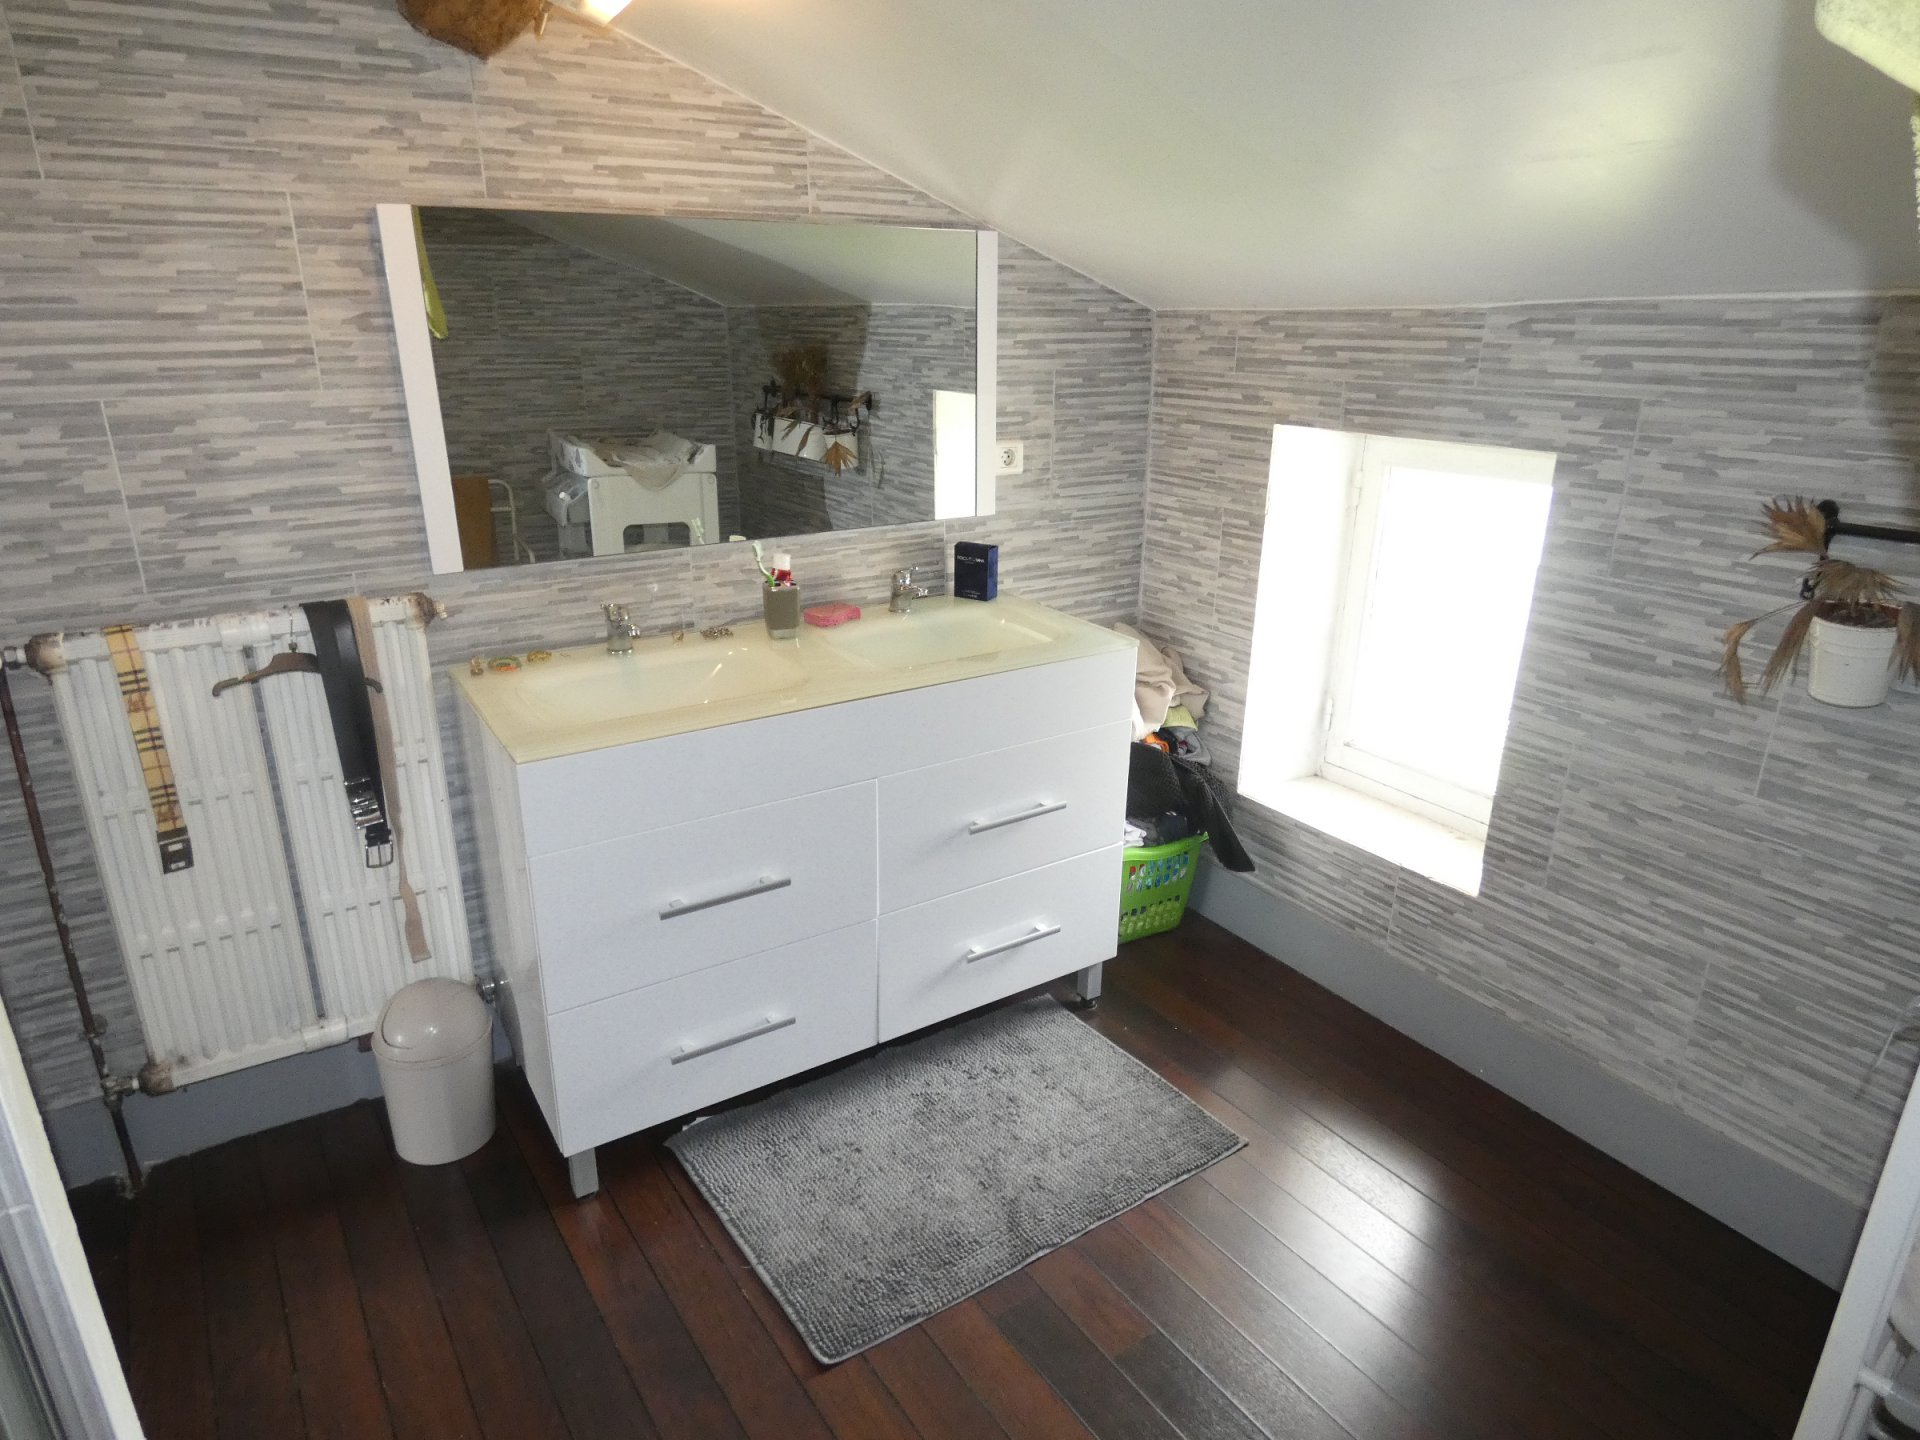 VILLAGE HOUSE IN STONES